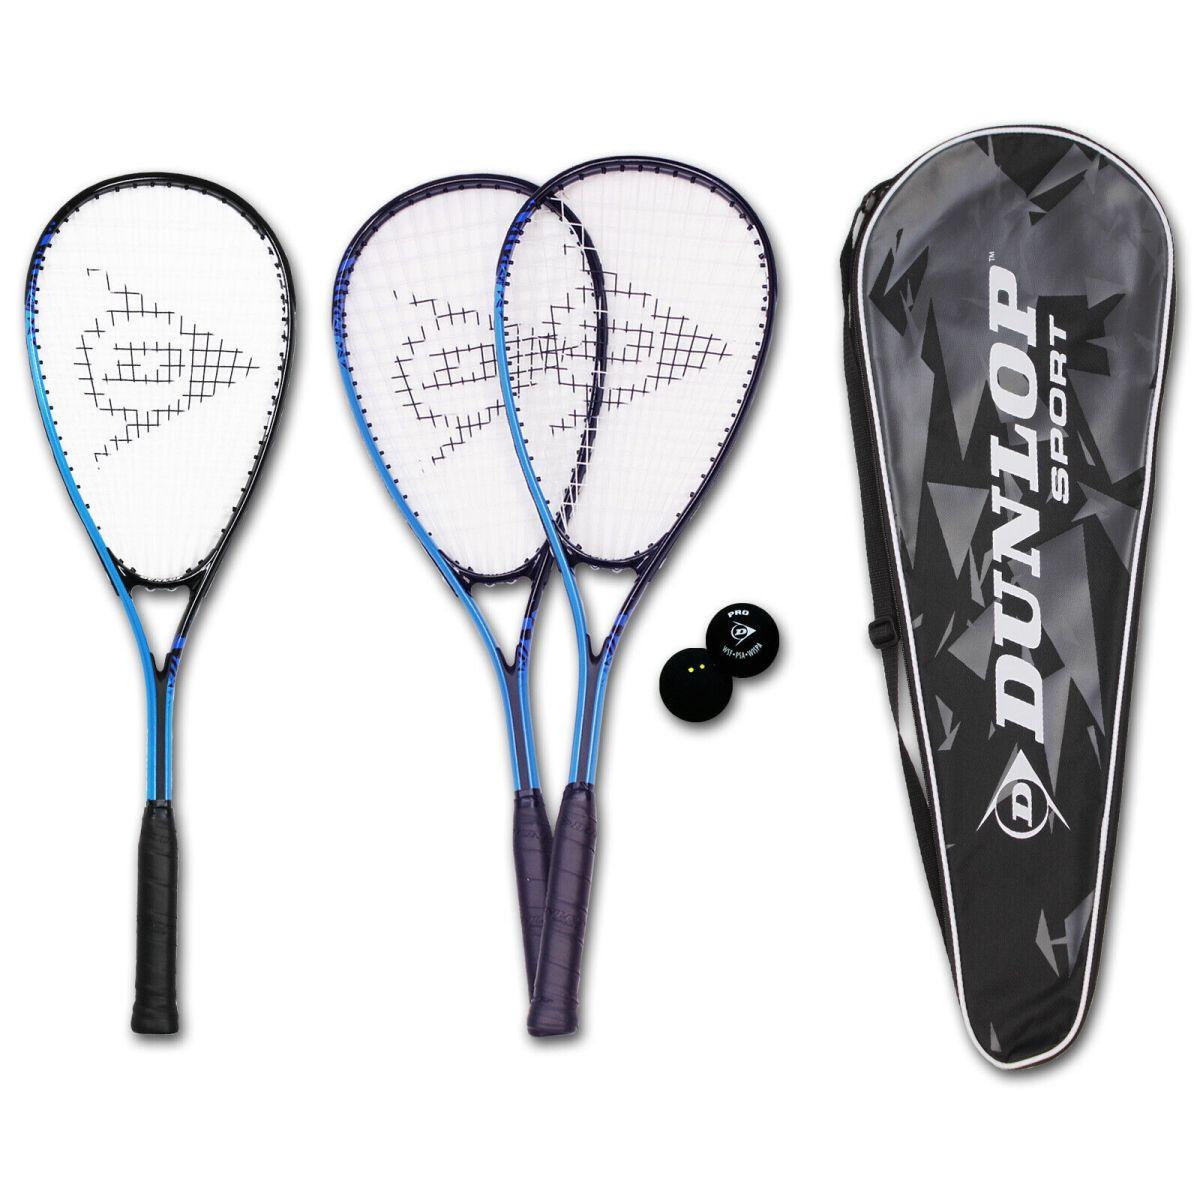 DUNLOP Force Xtreme Ti Squashschläger Squashset Ball 2 Punkte Tasche 4 Varianten